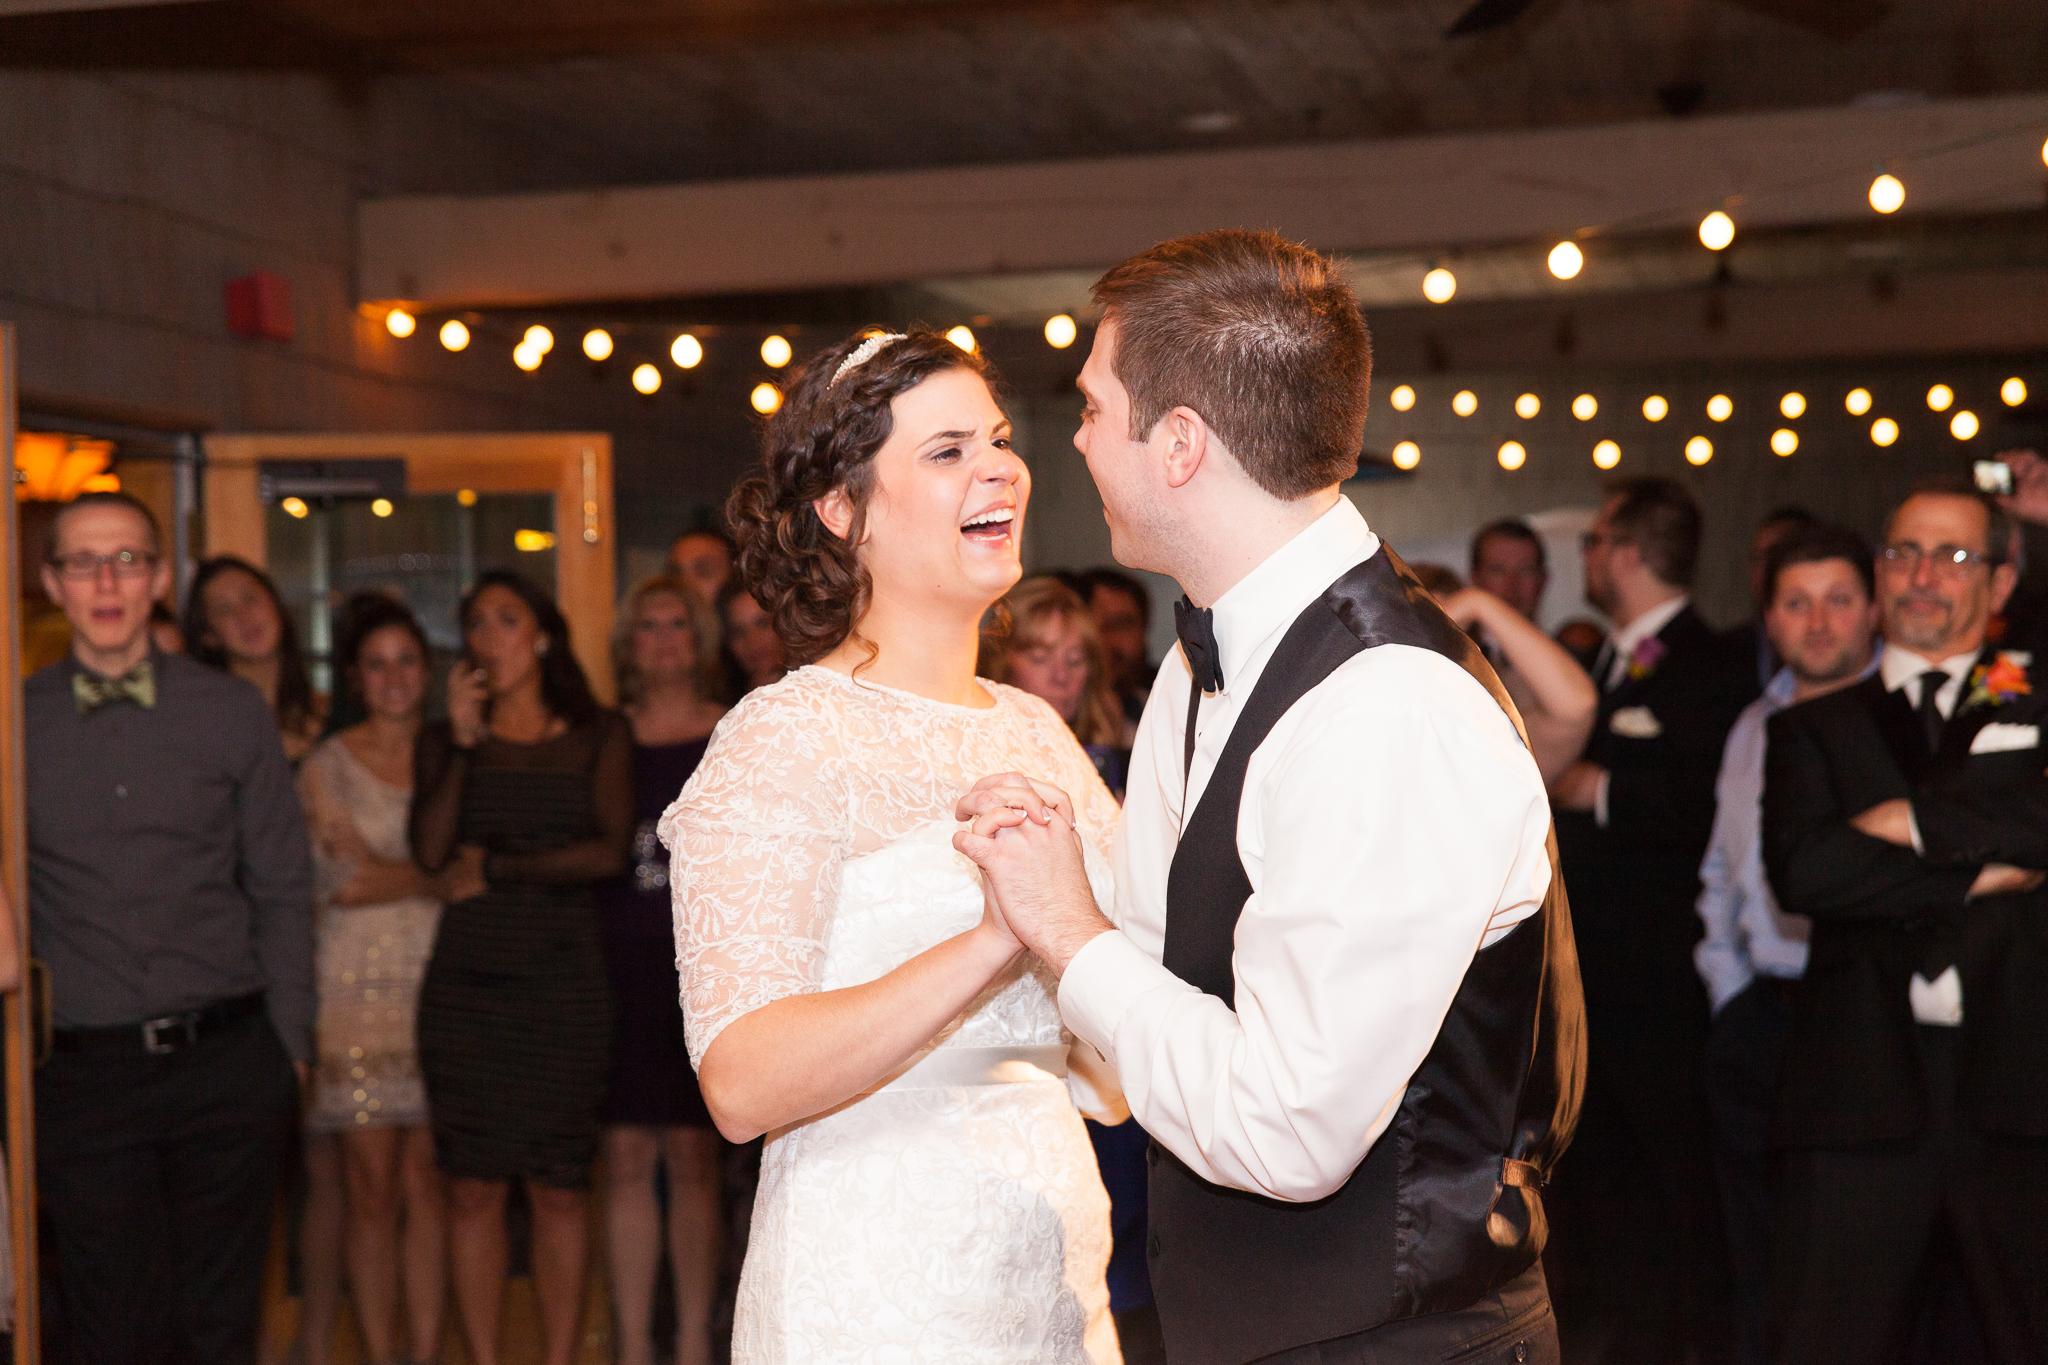 camuglia-whomstudio-chelsea_and_andy-nycphotographer-wedding-brooklyn-buffalo-timberlodge-118-0757.jpg